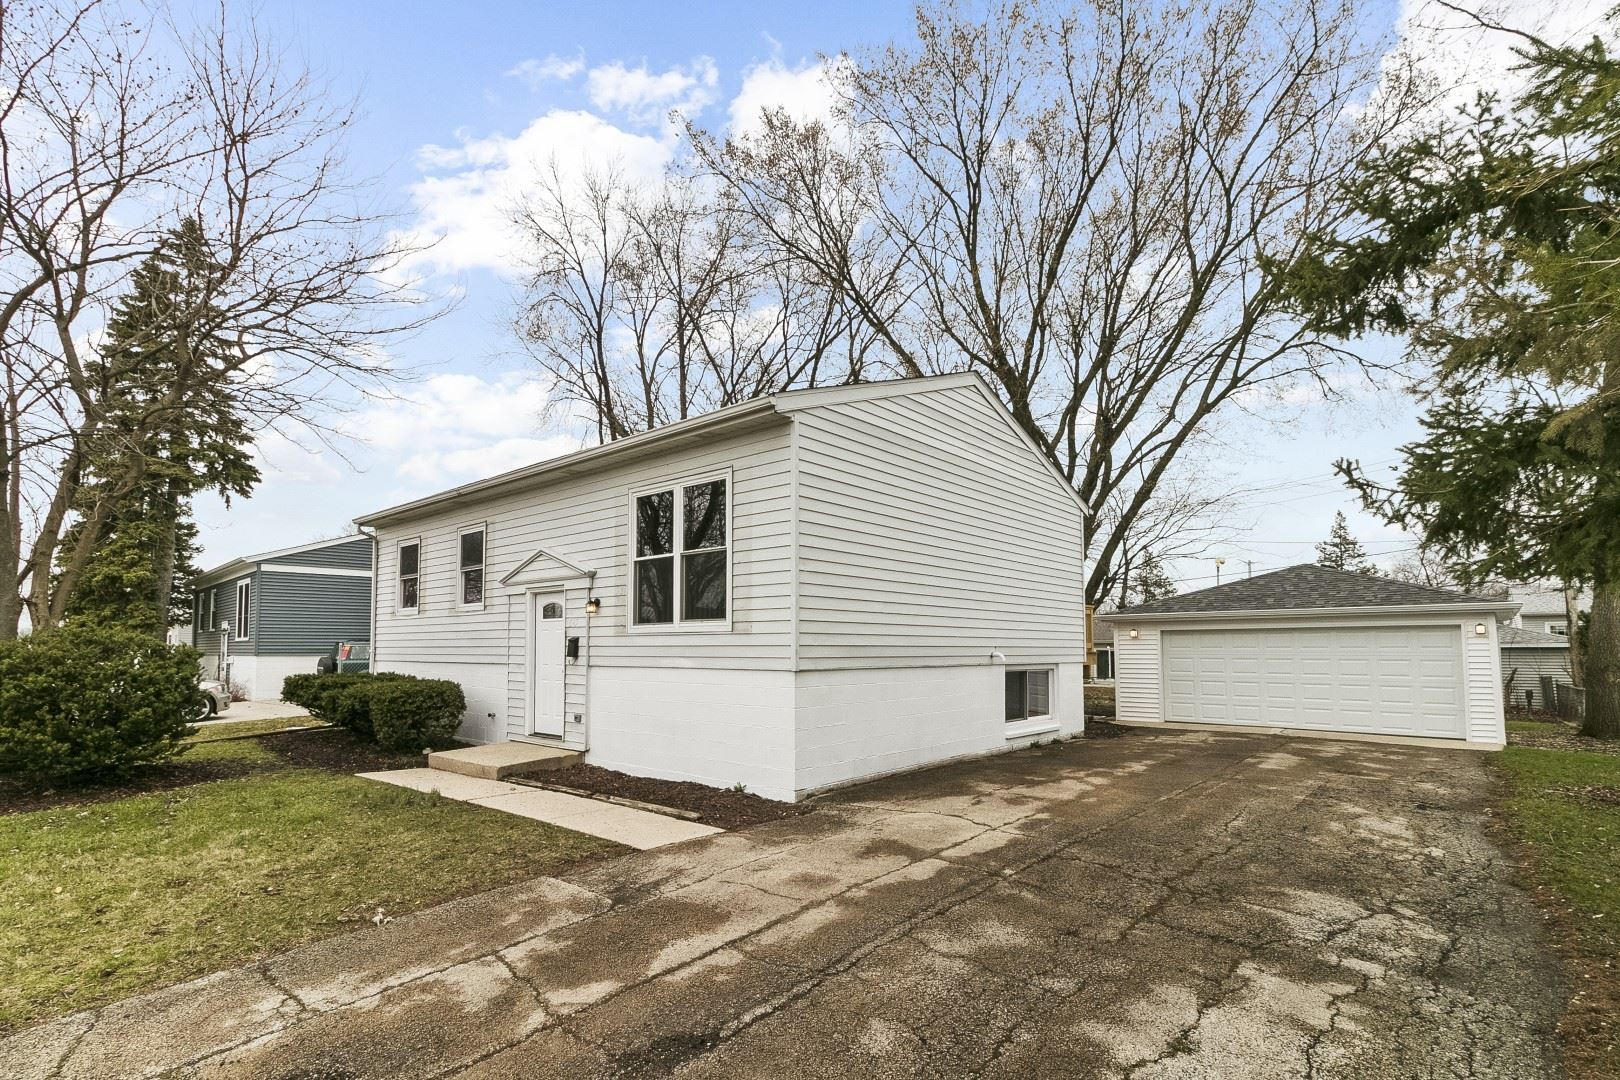 Photo of 647 Belmont Drive, Romeoville, IL 60446 (MLS # 11036230)